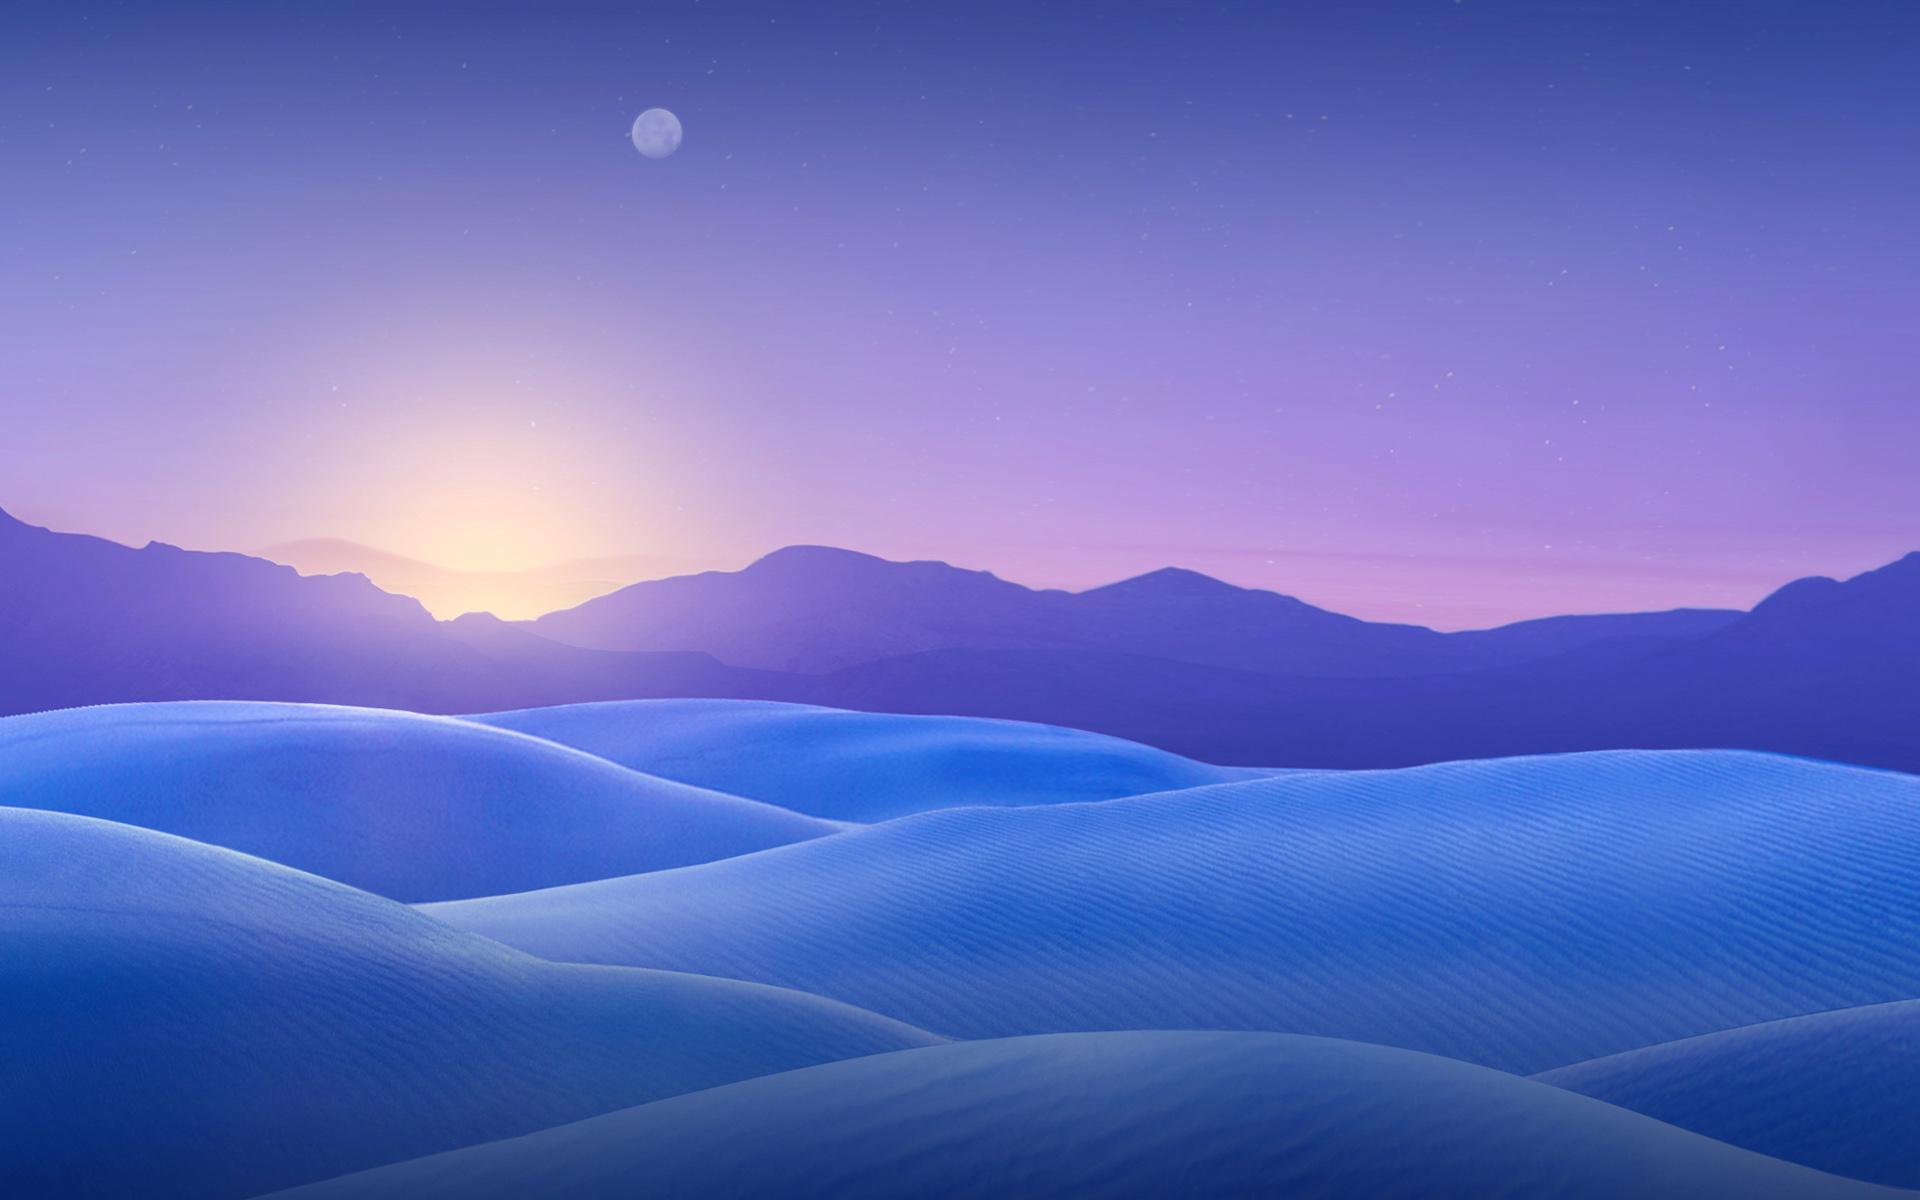 HD Wallpapers Blue Dunes